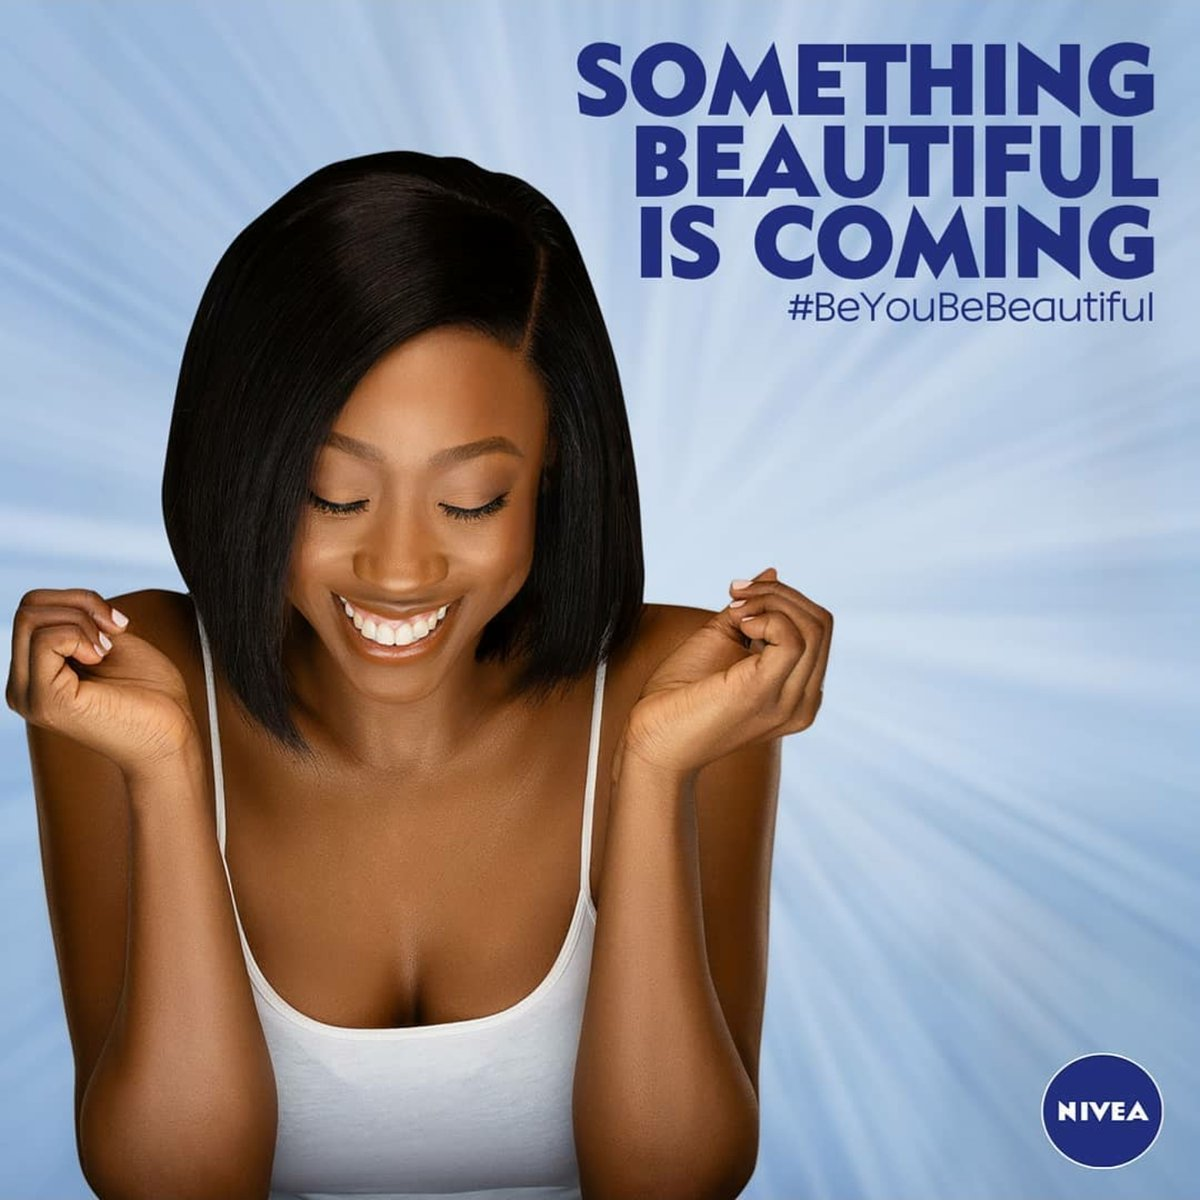 Exciting times.... @BeverlyNaya X @nivea Nigeria https://t.co/nTx6lm0mYz